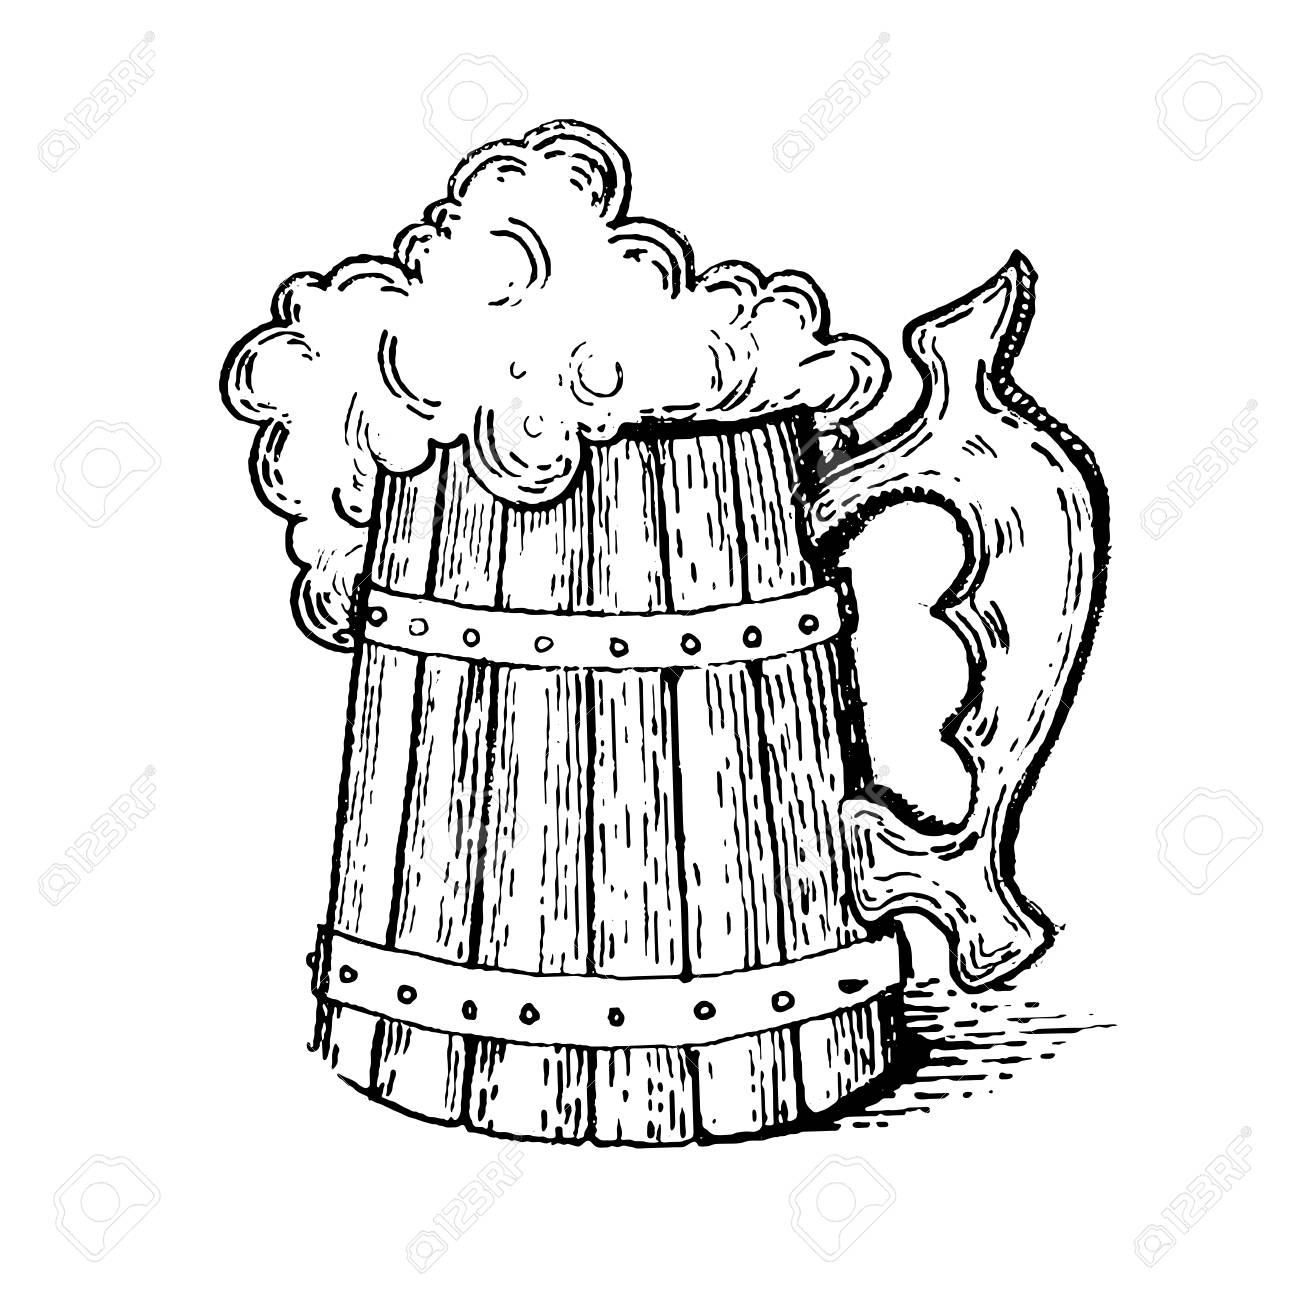 Drawing at getdrawings com. Beer clipart sketch